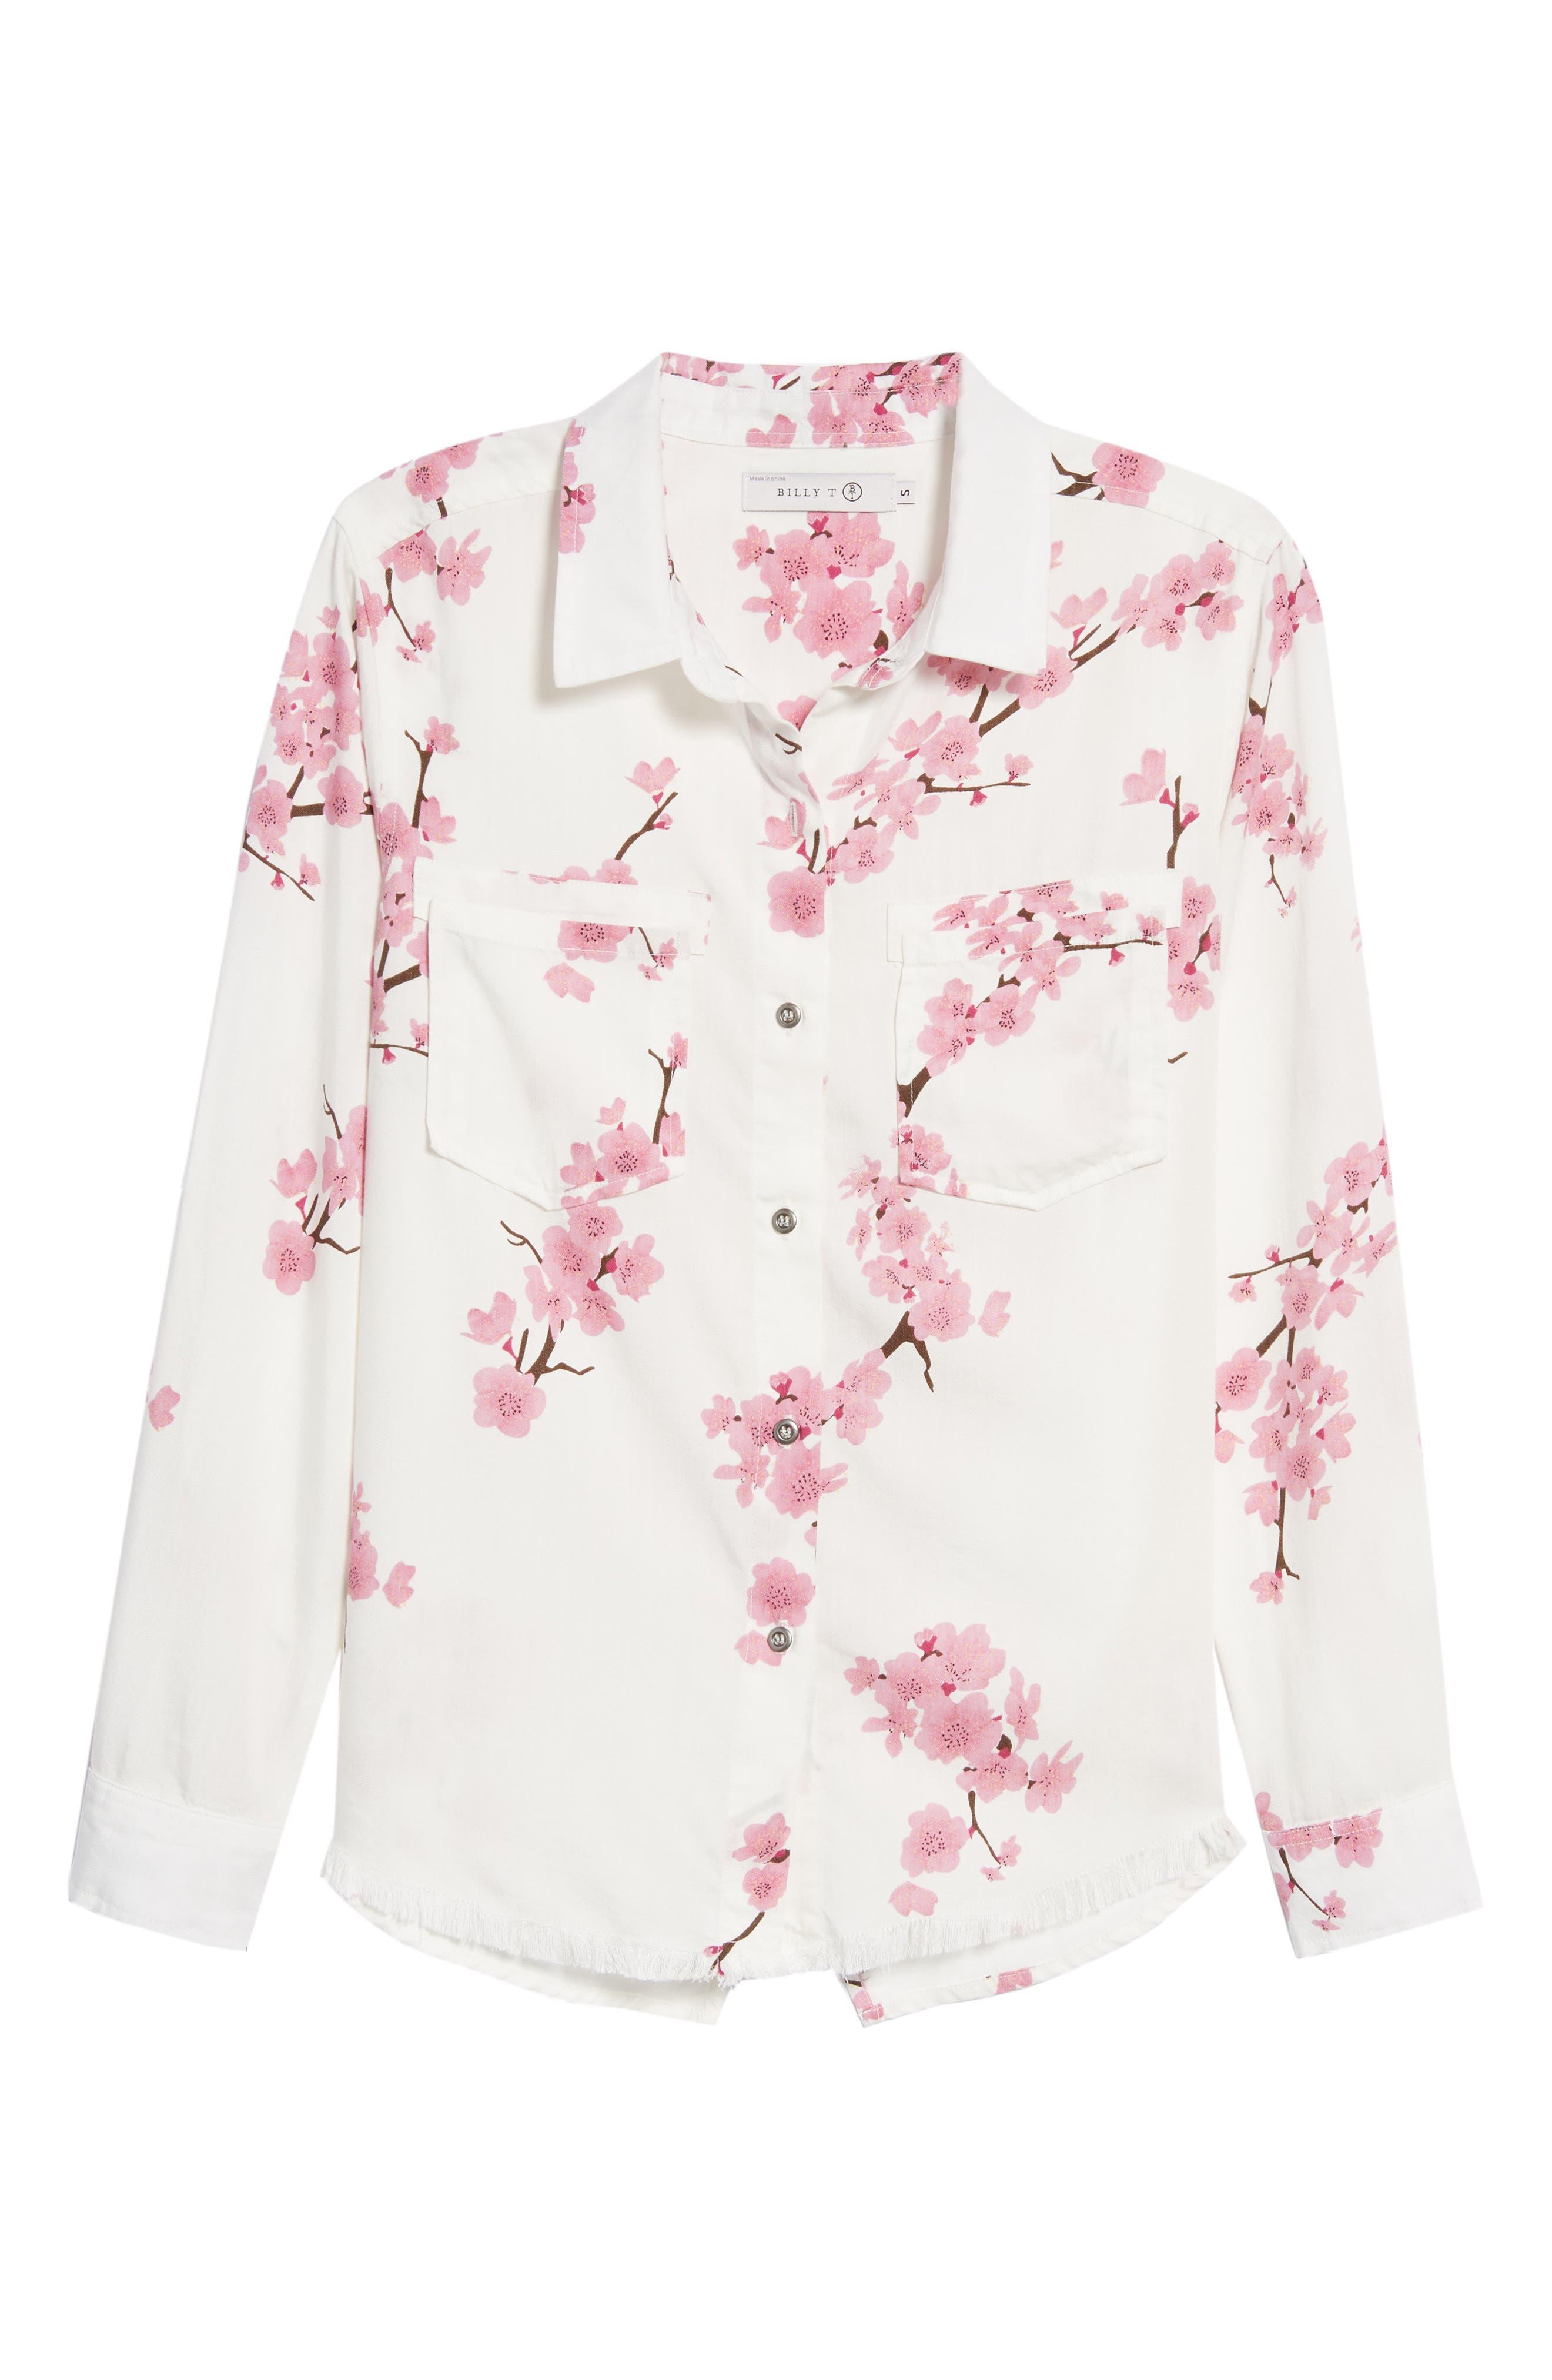 Cherry Blossom Roll Tab Sleeve Shirt,                             Alternate thumbnail 7, color,                             White Cherry Blossom